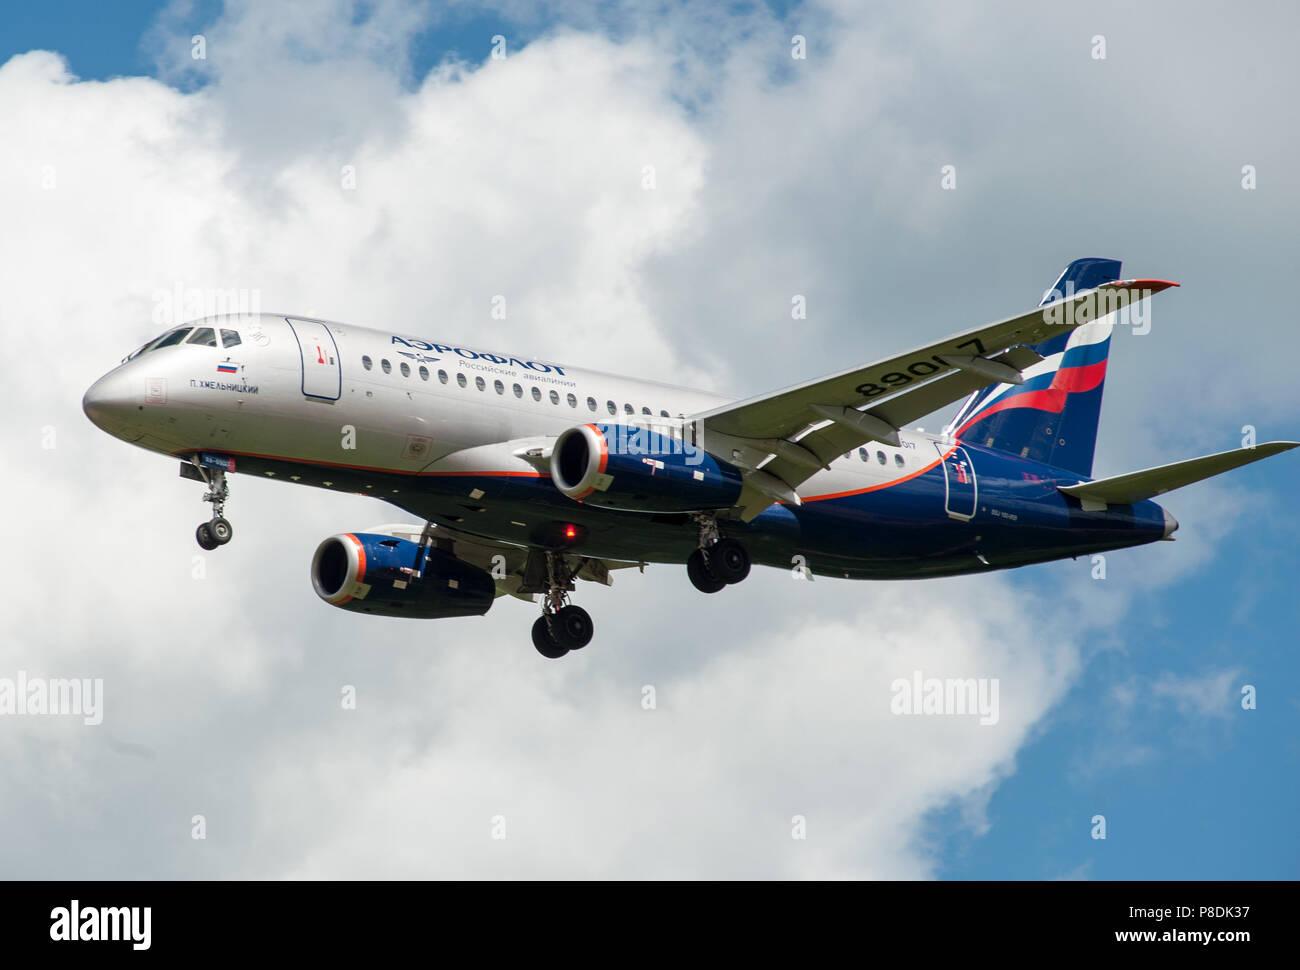 SHEREMETYEVO, MOSCOW REGION, RUSSIA - June 28, 2017: Sukhoi